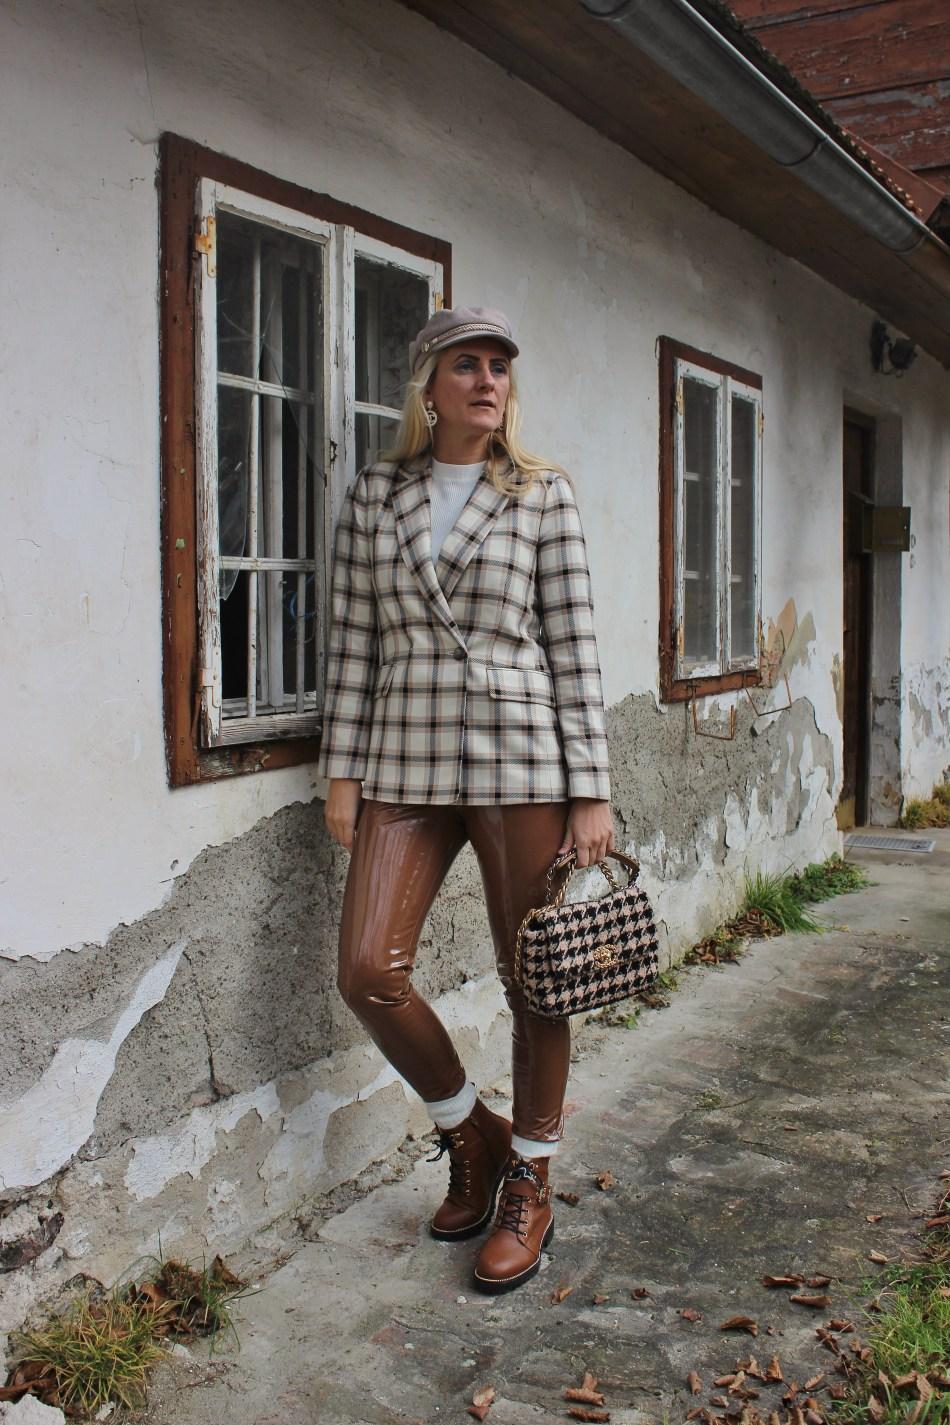 Karo-Hahnentritt-Lackhose-Patend-Leather-Pants-carrieslifestyle-Tamara-Prutsch